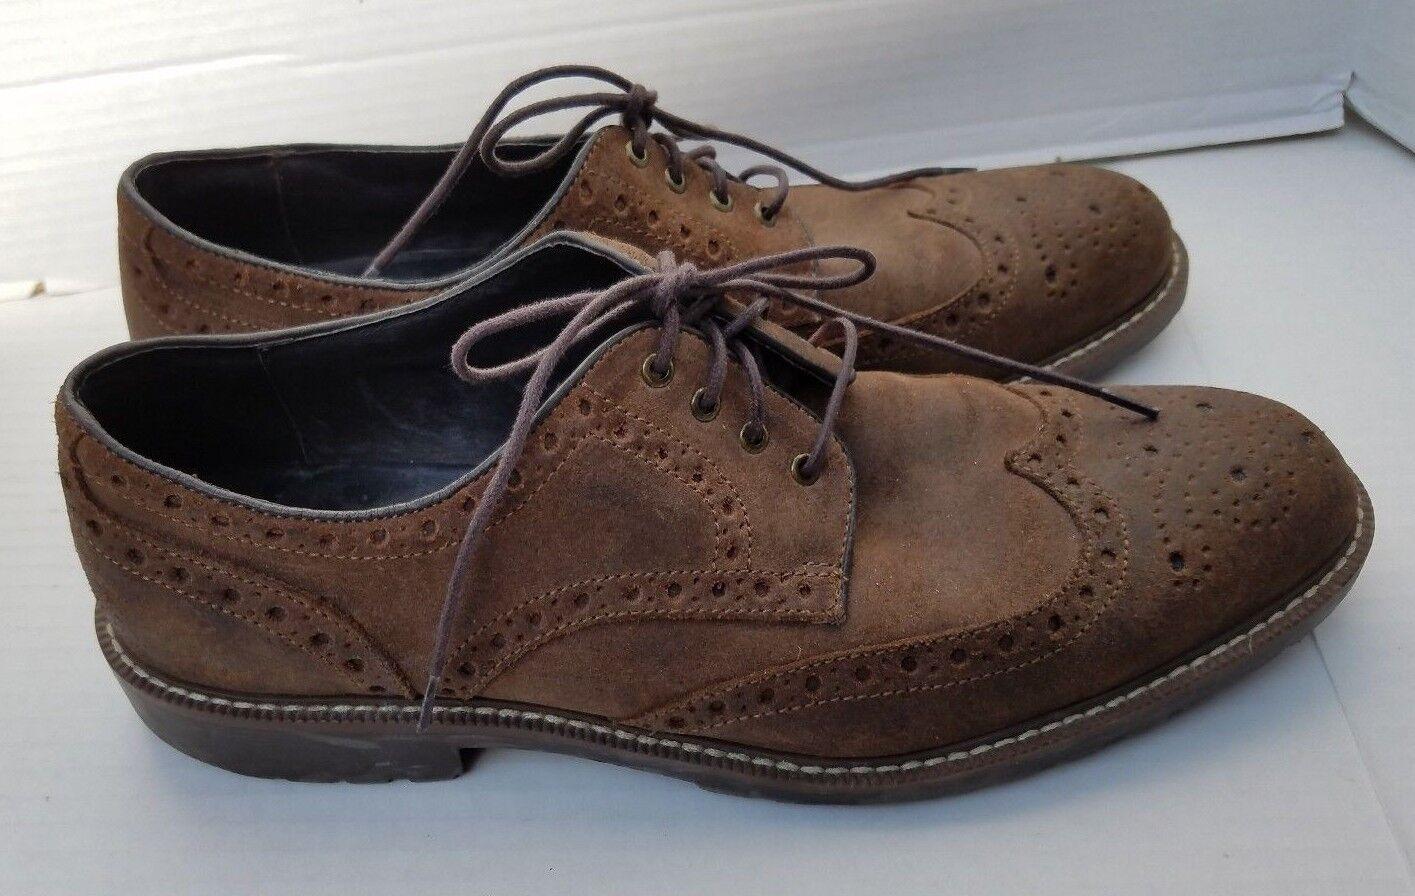 Scarpe casual da uomo  JOHNSTON & MURPHY Suede Brown Chukka WingTip Dress Oxford Dress Shoes uomos 11